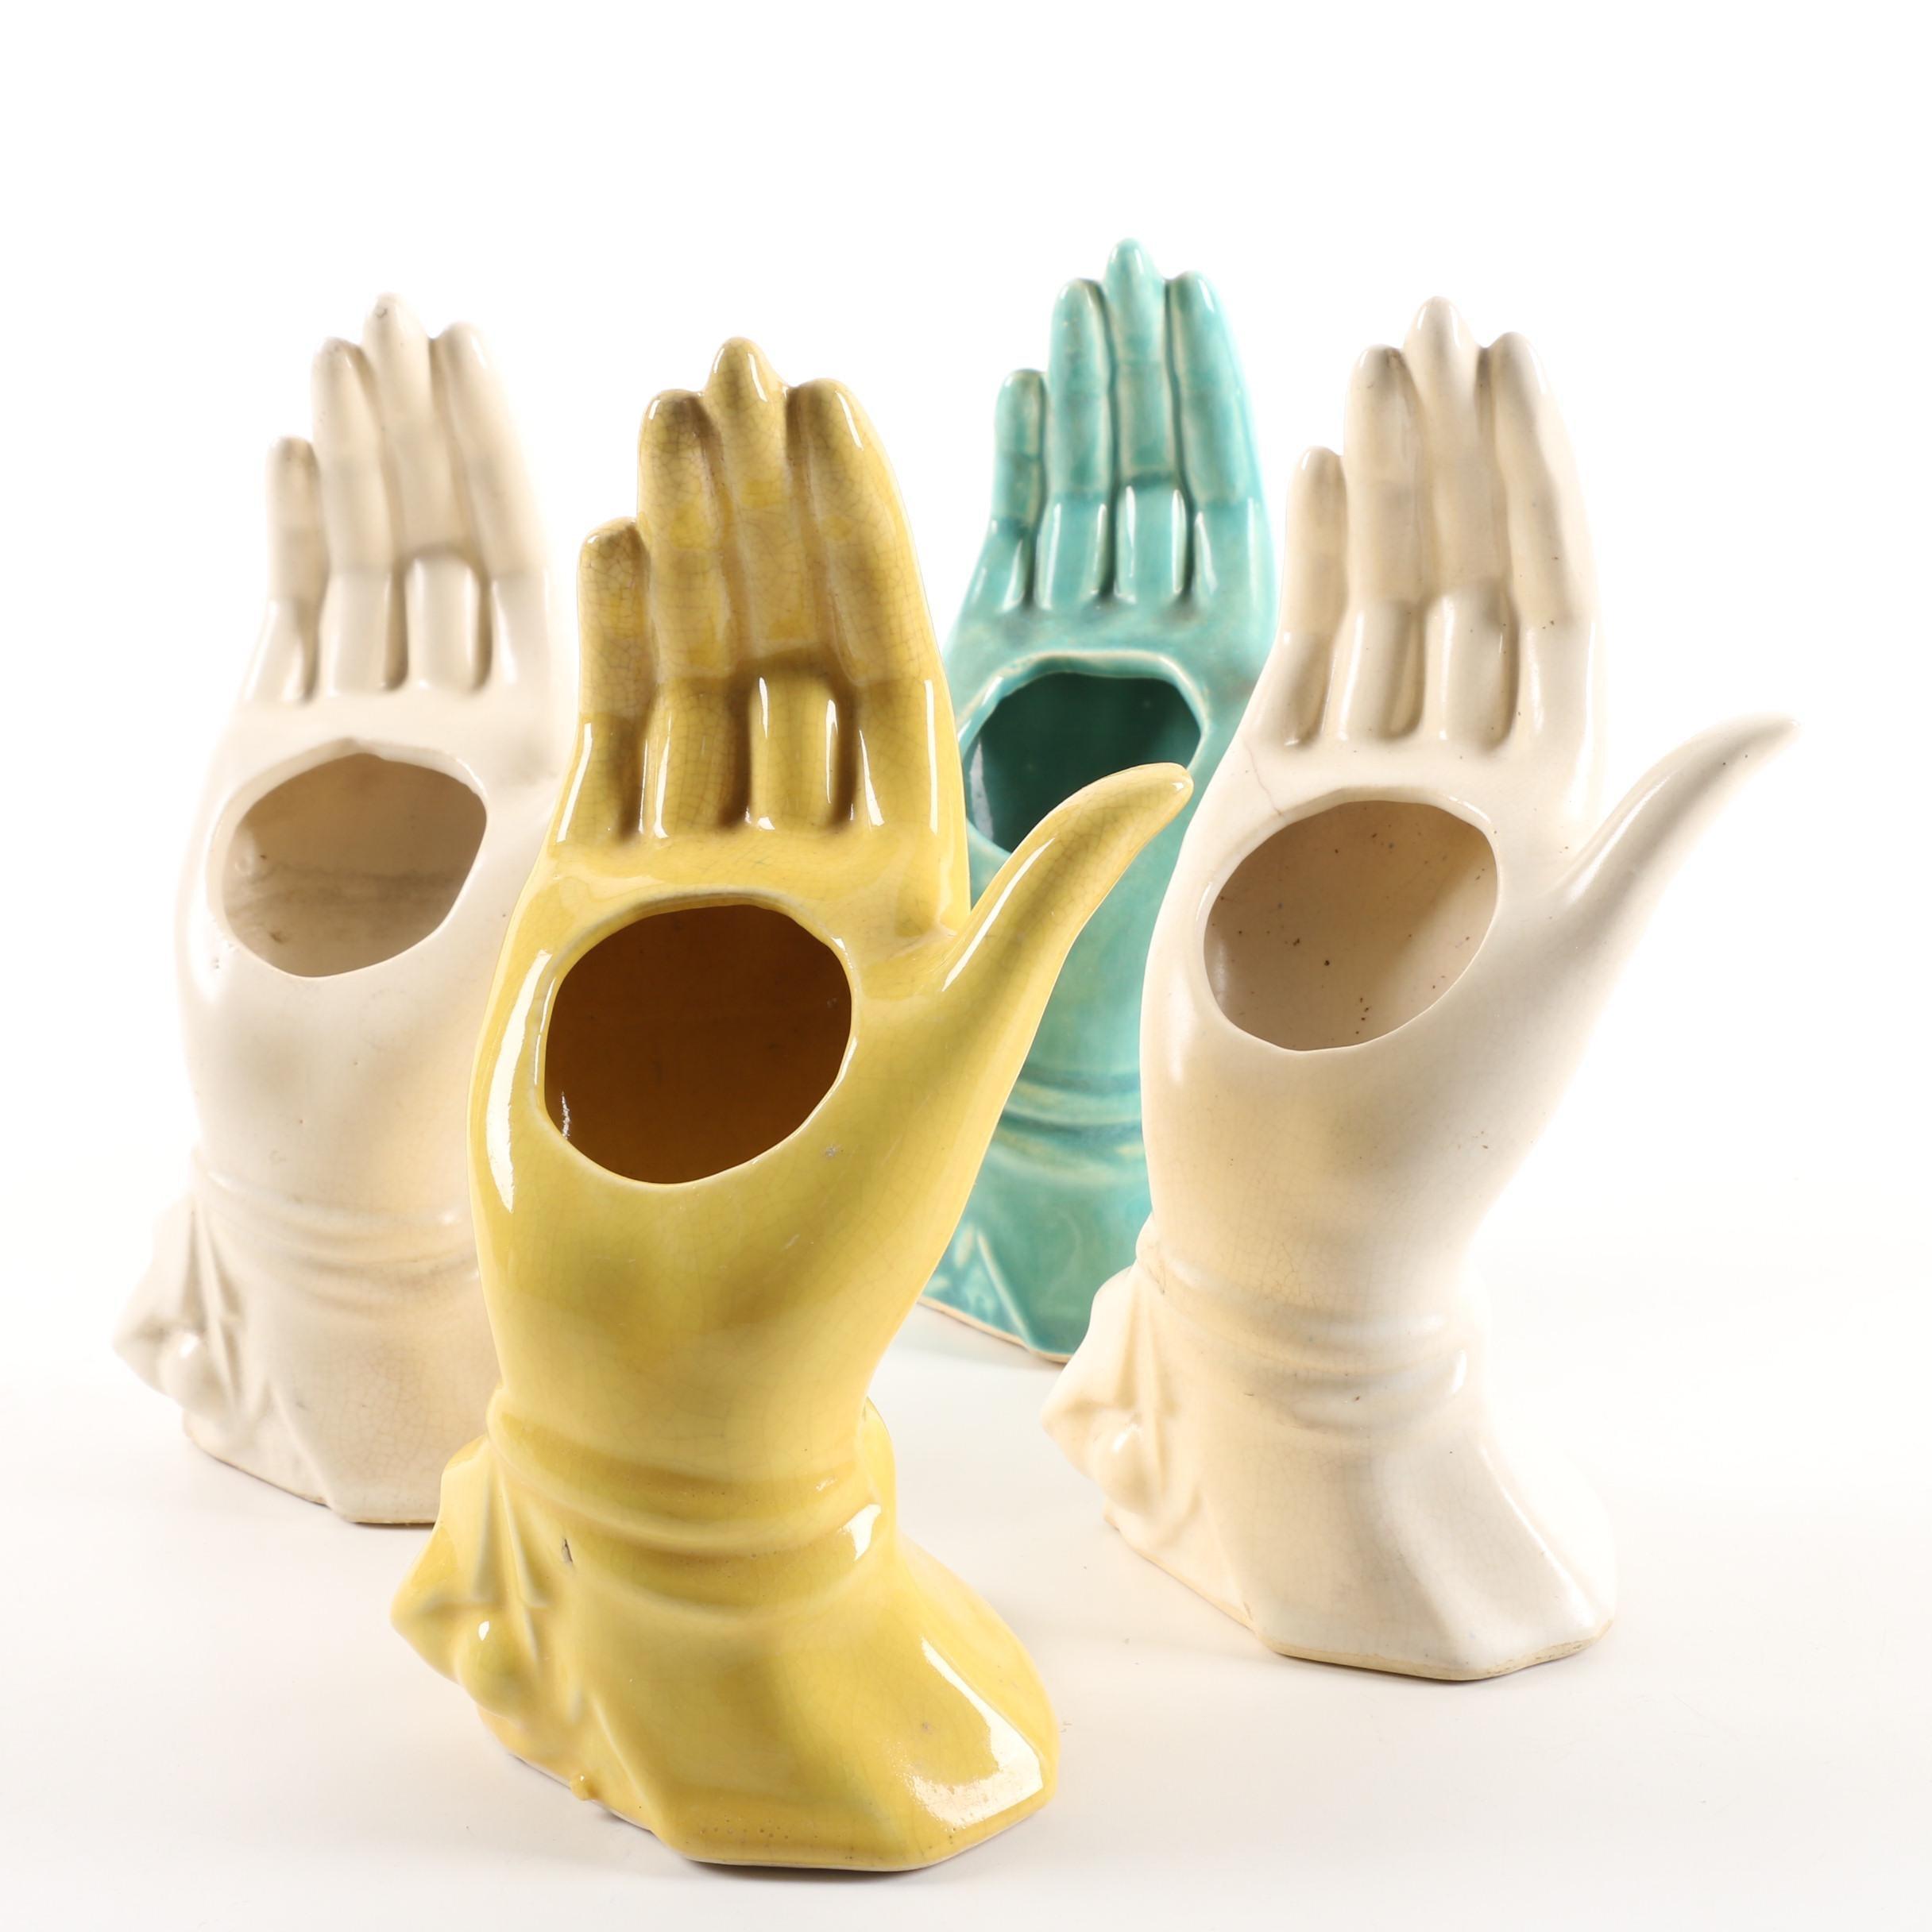 Vintage McCoy Pottery Hand Vases